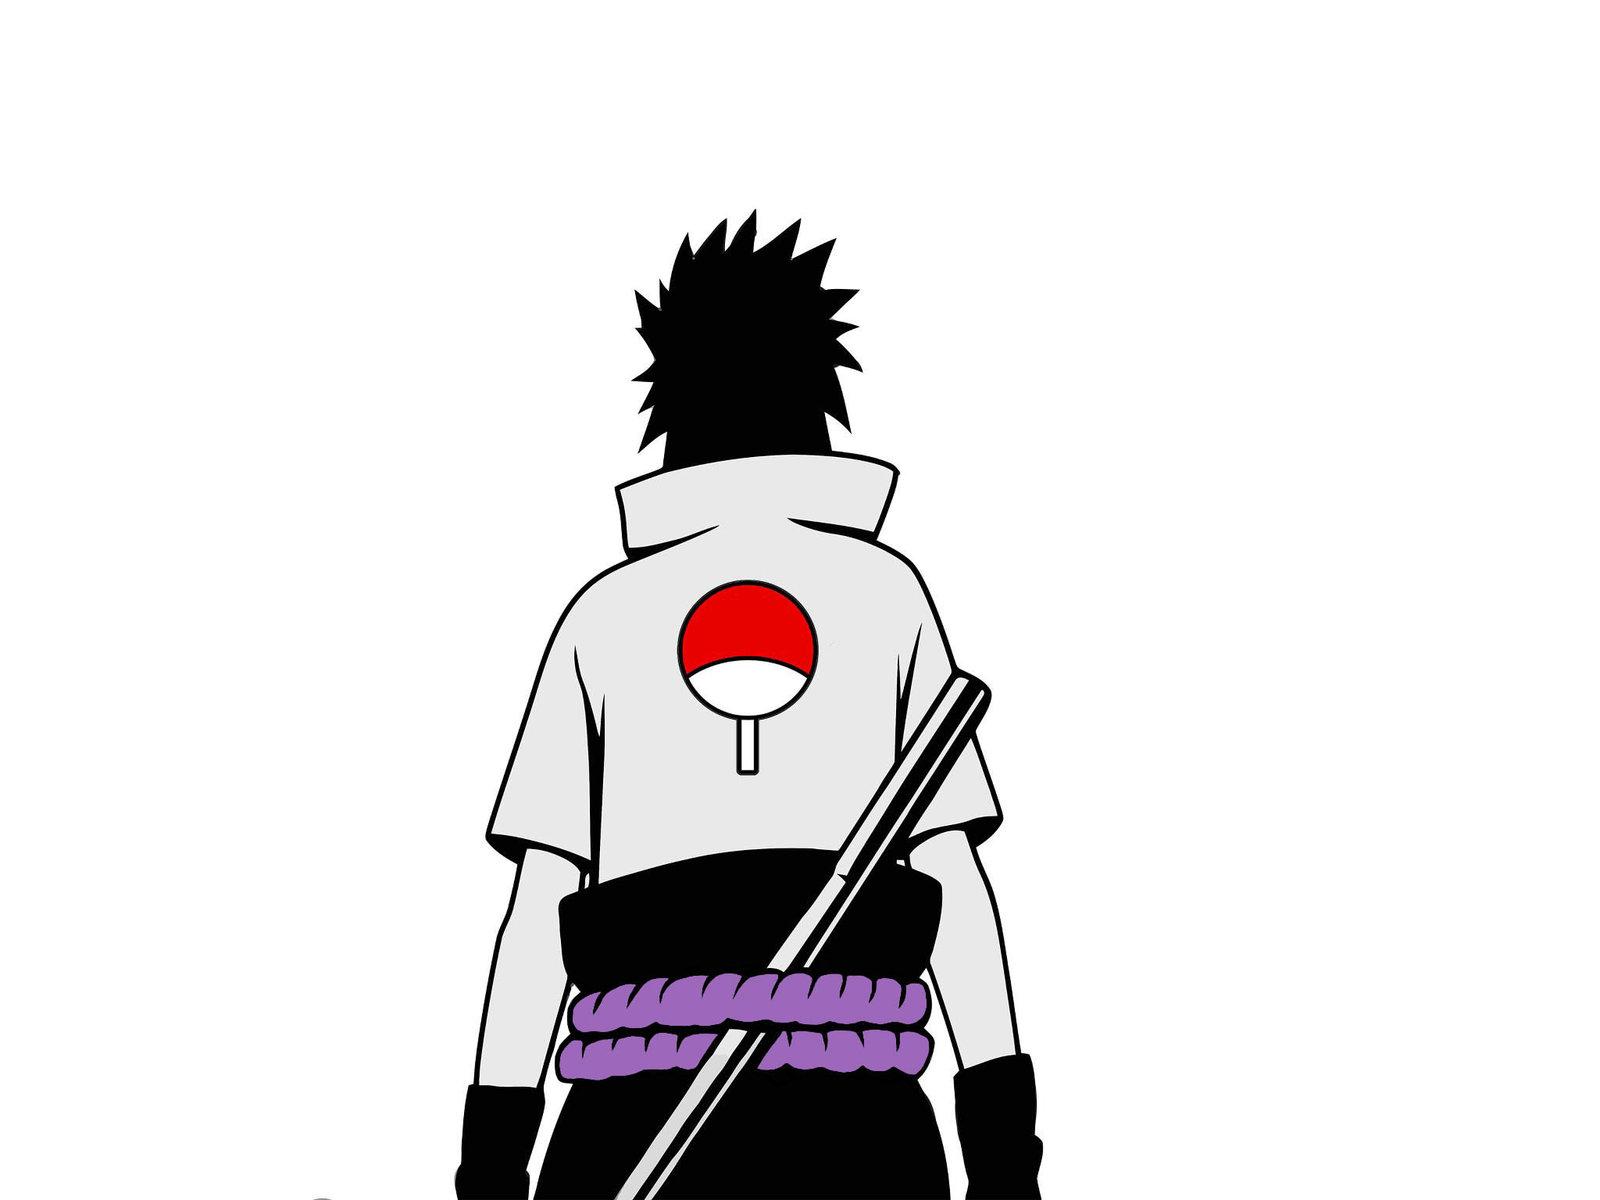 Sasuke Uchiha Wallpaper by Yahboijronq 1600x1200